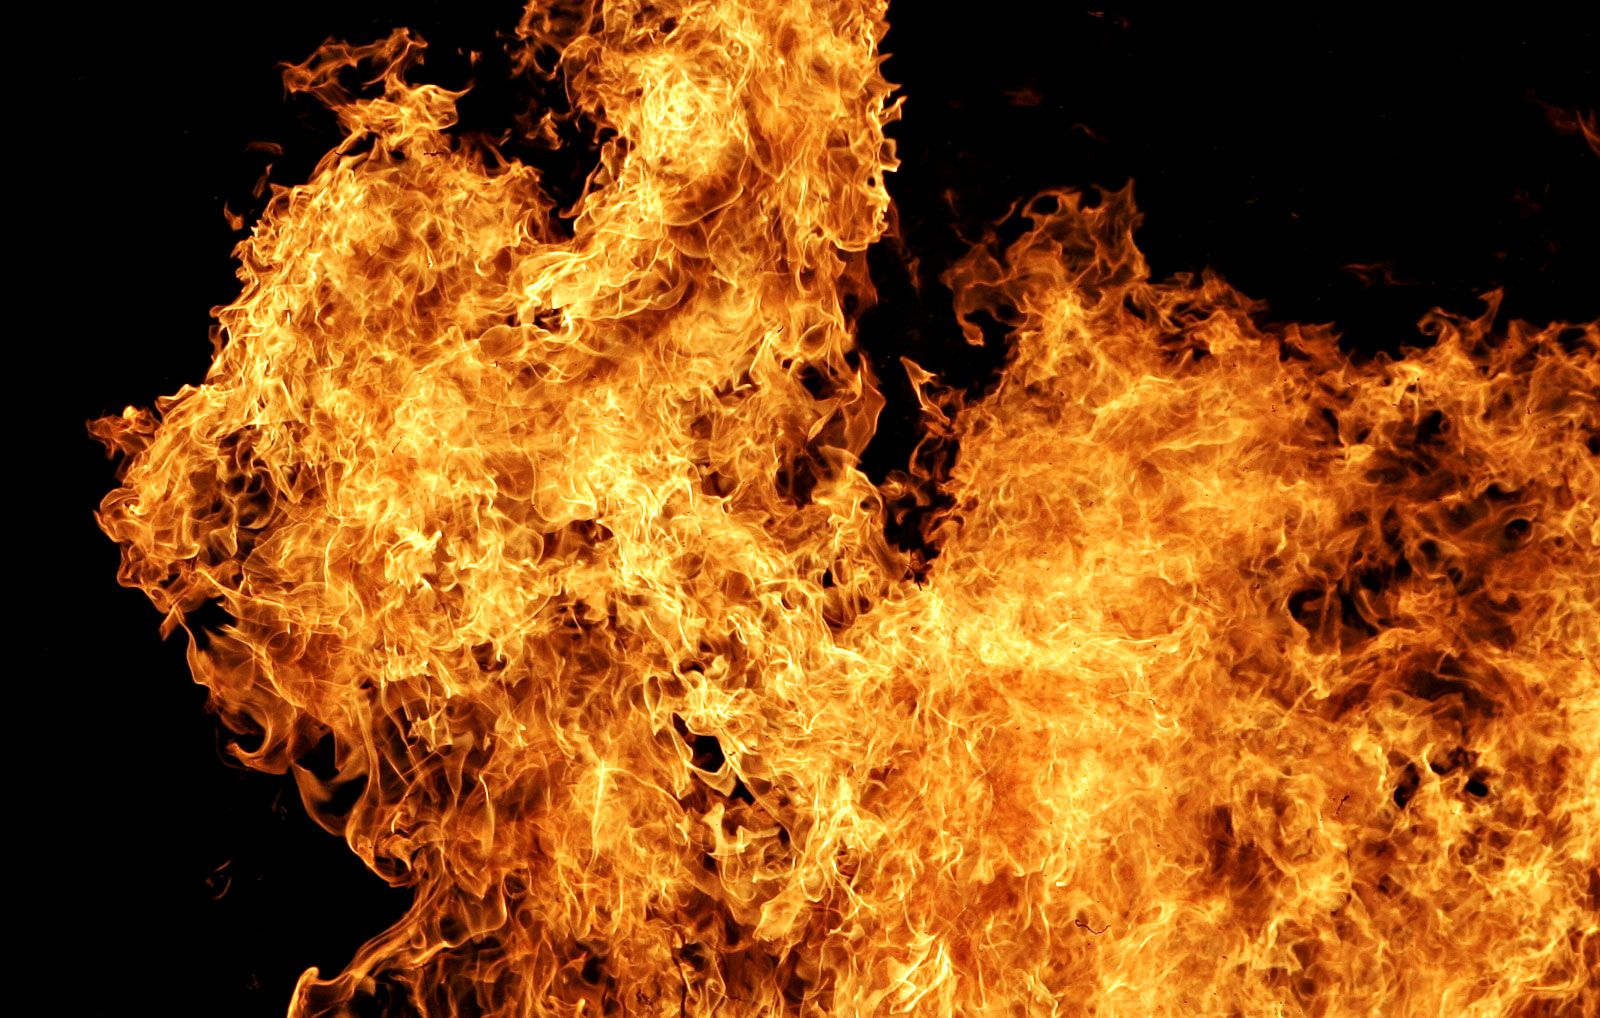 В Днепре 4-летний ребенок поджег квартиру. Новости Днепра